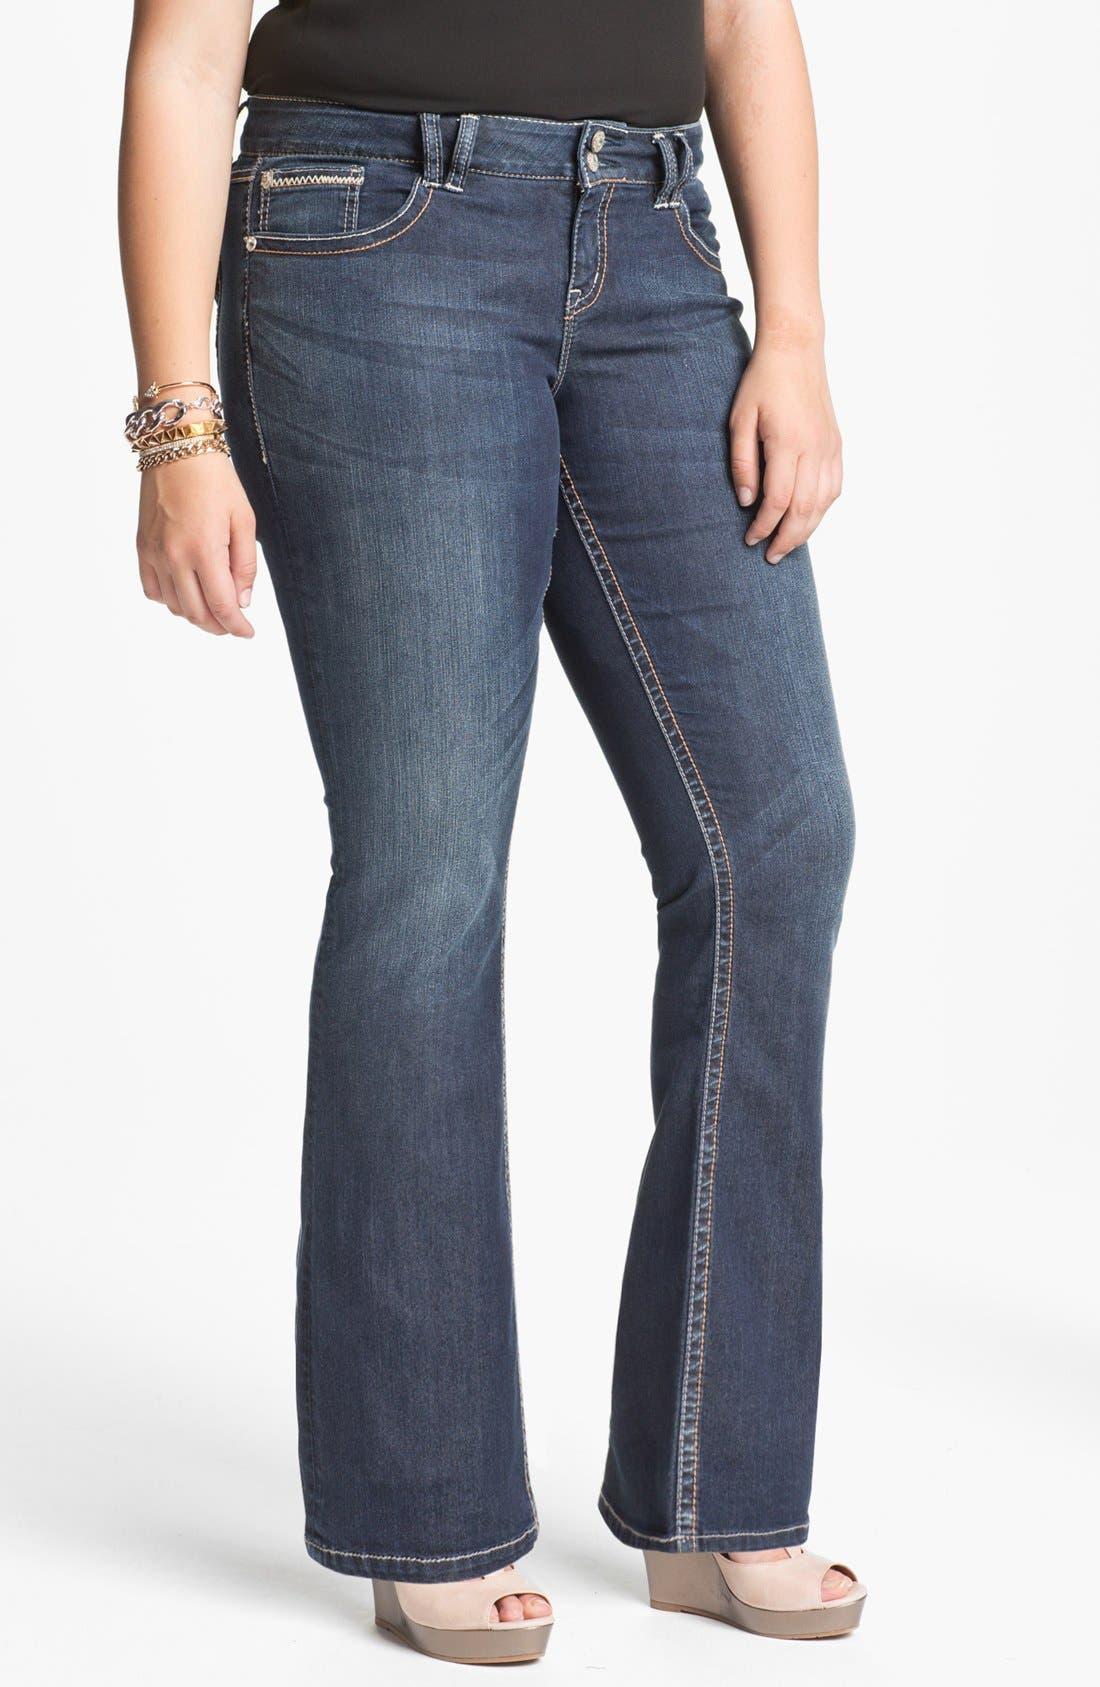 Main Image - Silver Jeans Co. 'Dawson' Bootcut Jeans (Juniors Plus)